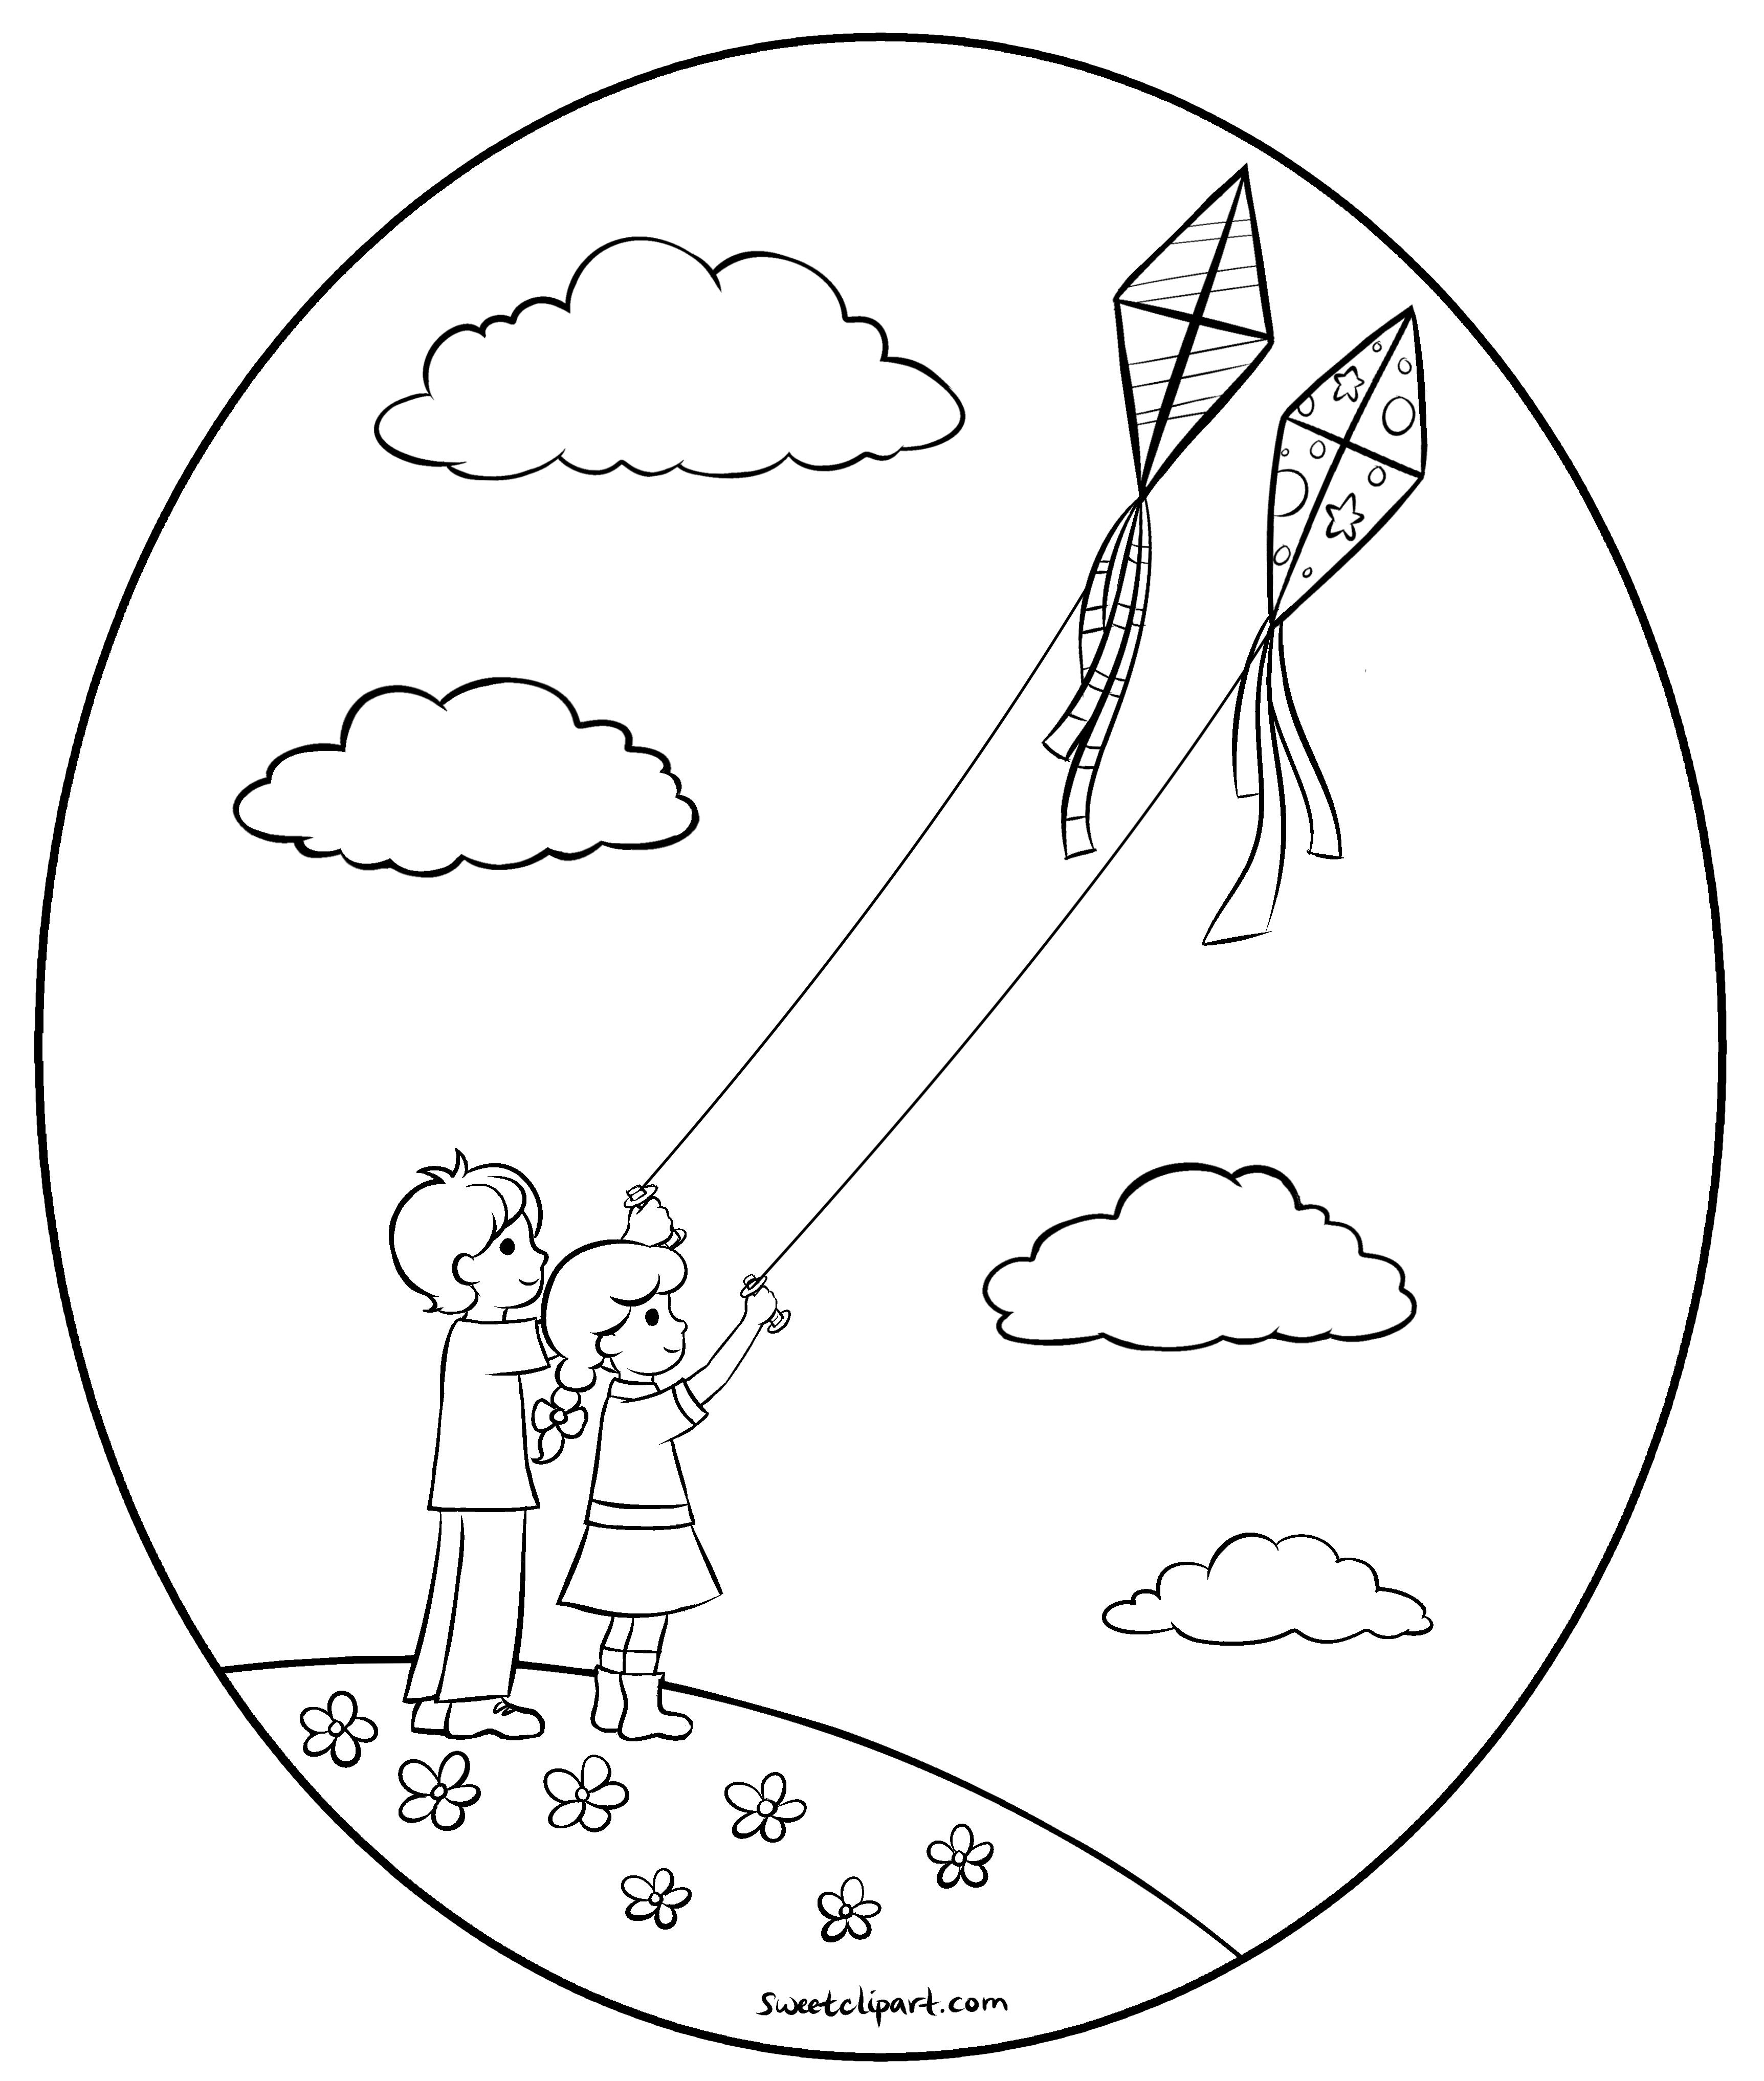 Kite Flying Drawing at GetDrawings | Free download